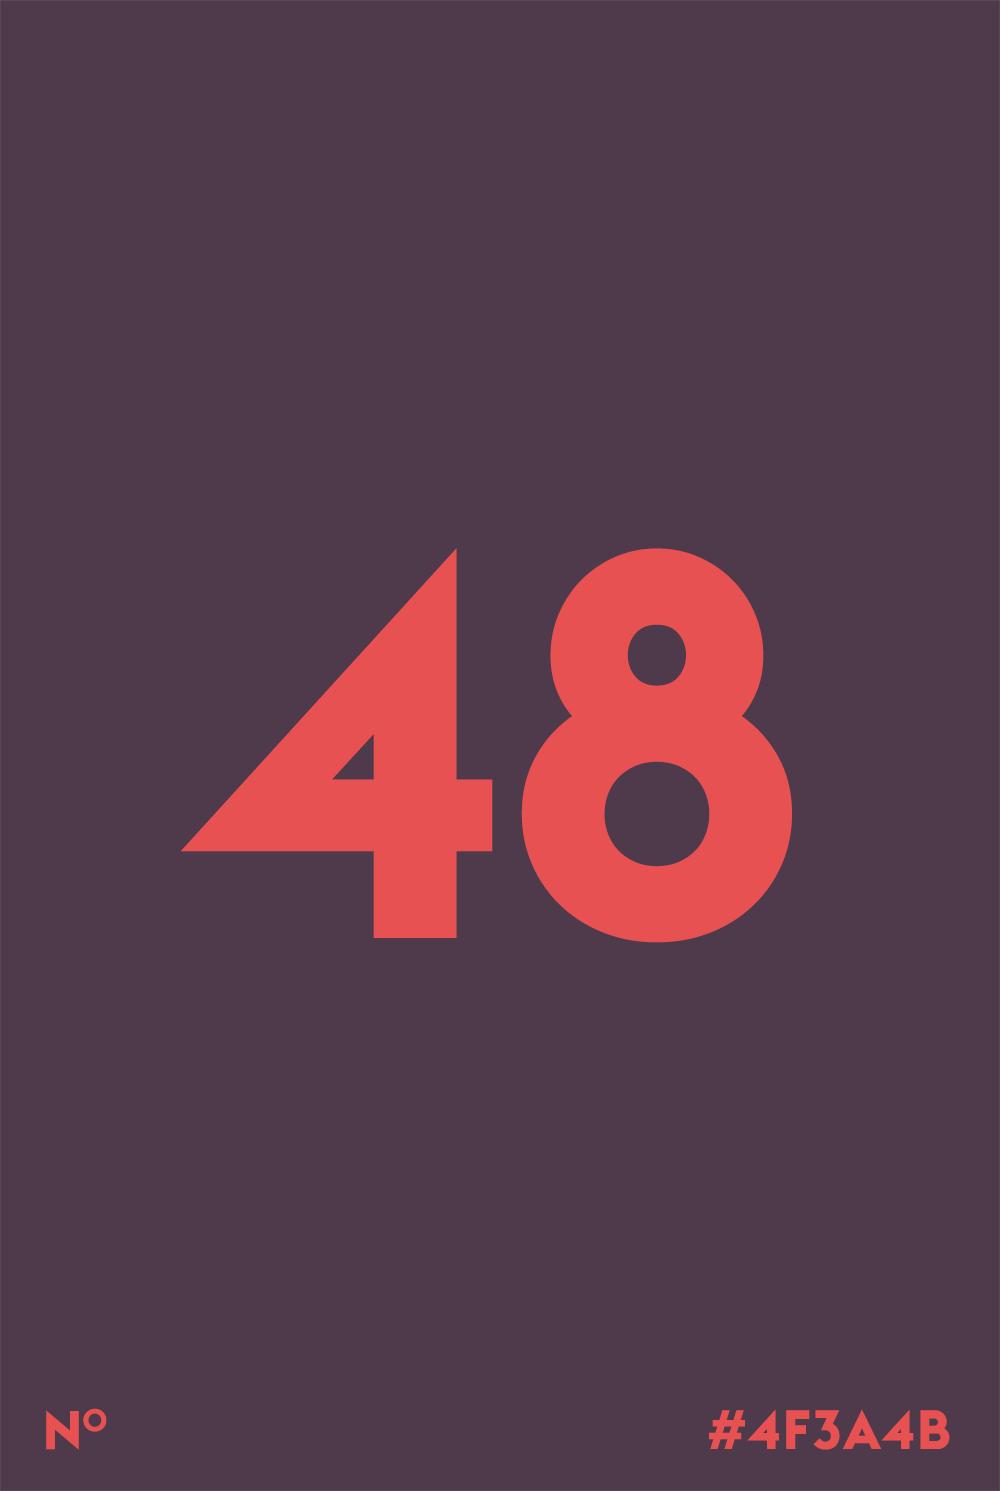 cc_0047_48